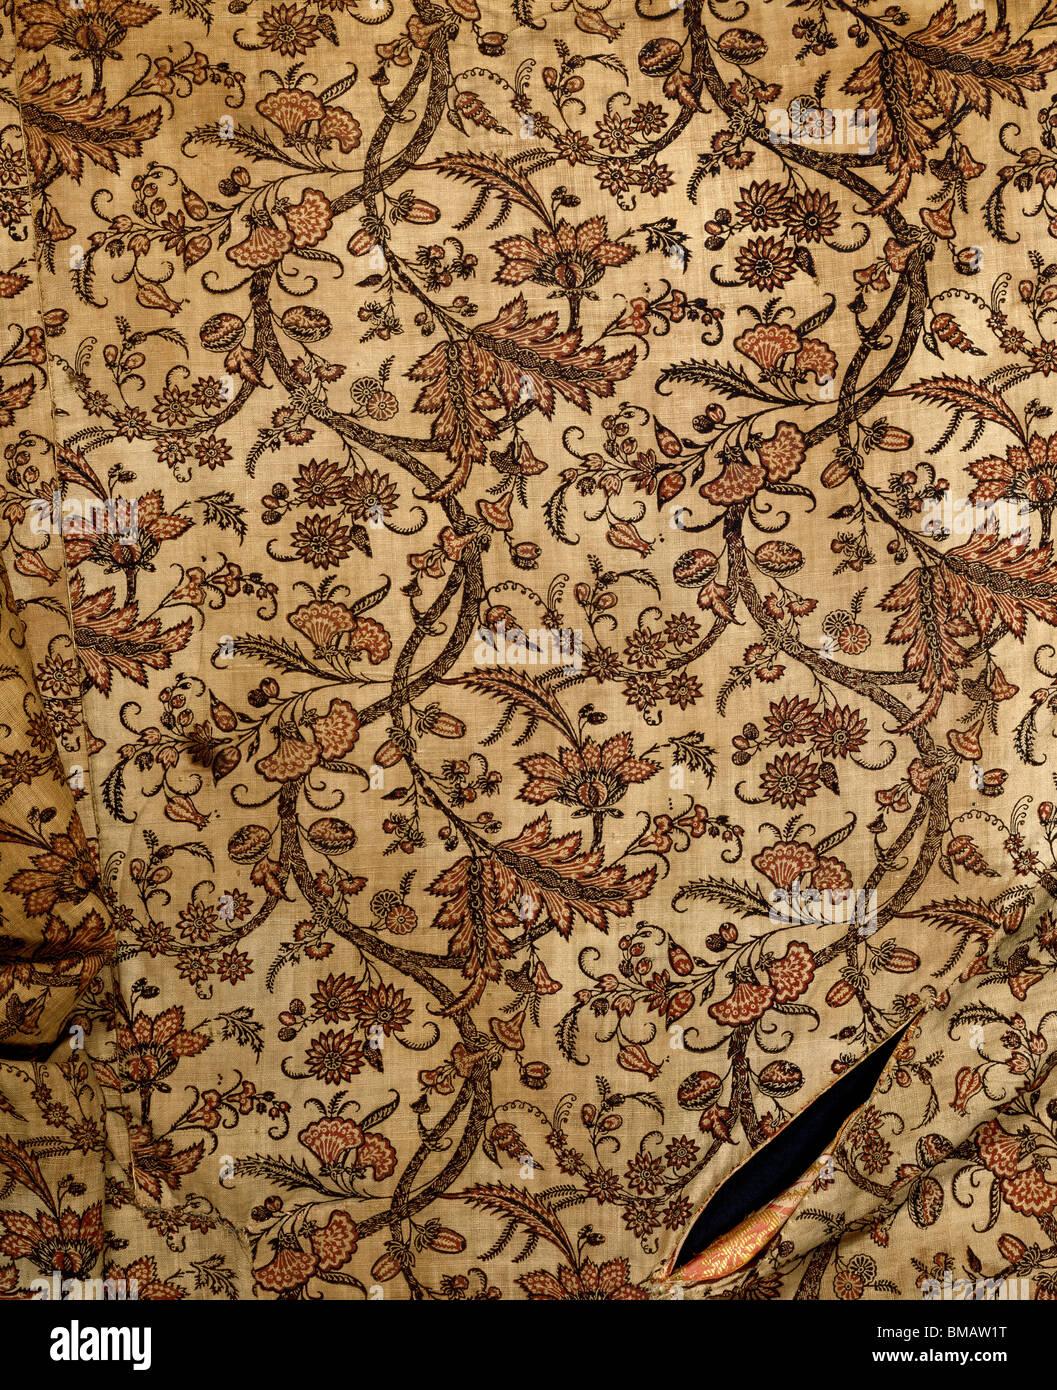 Banyan. England, 18th century - Stock Image